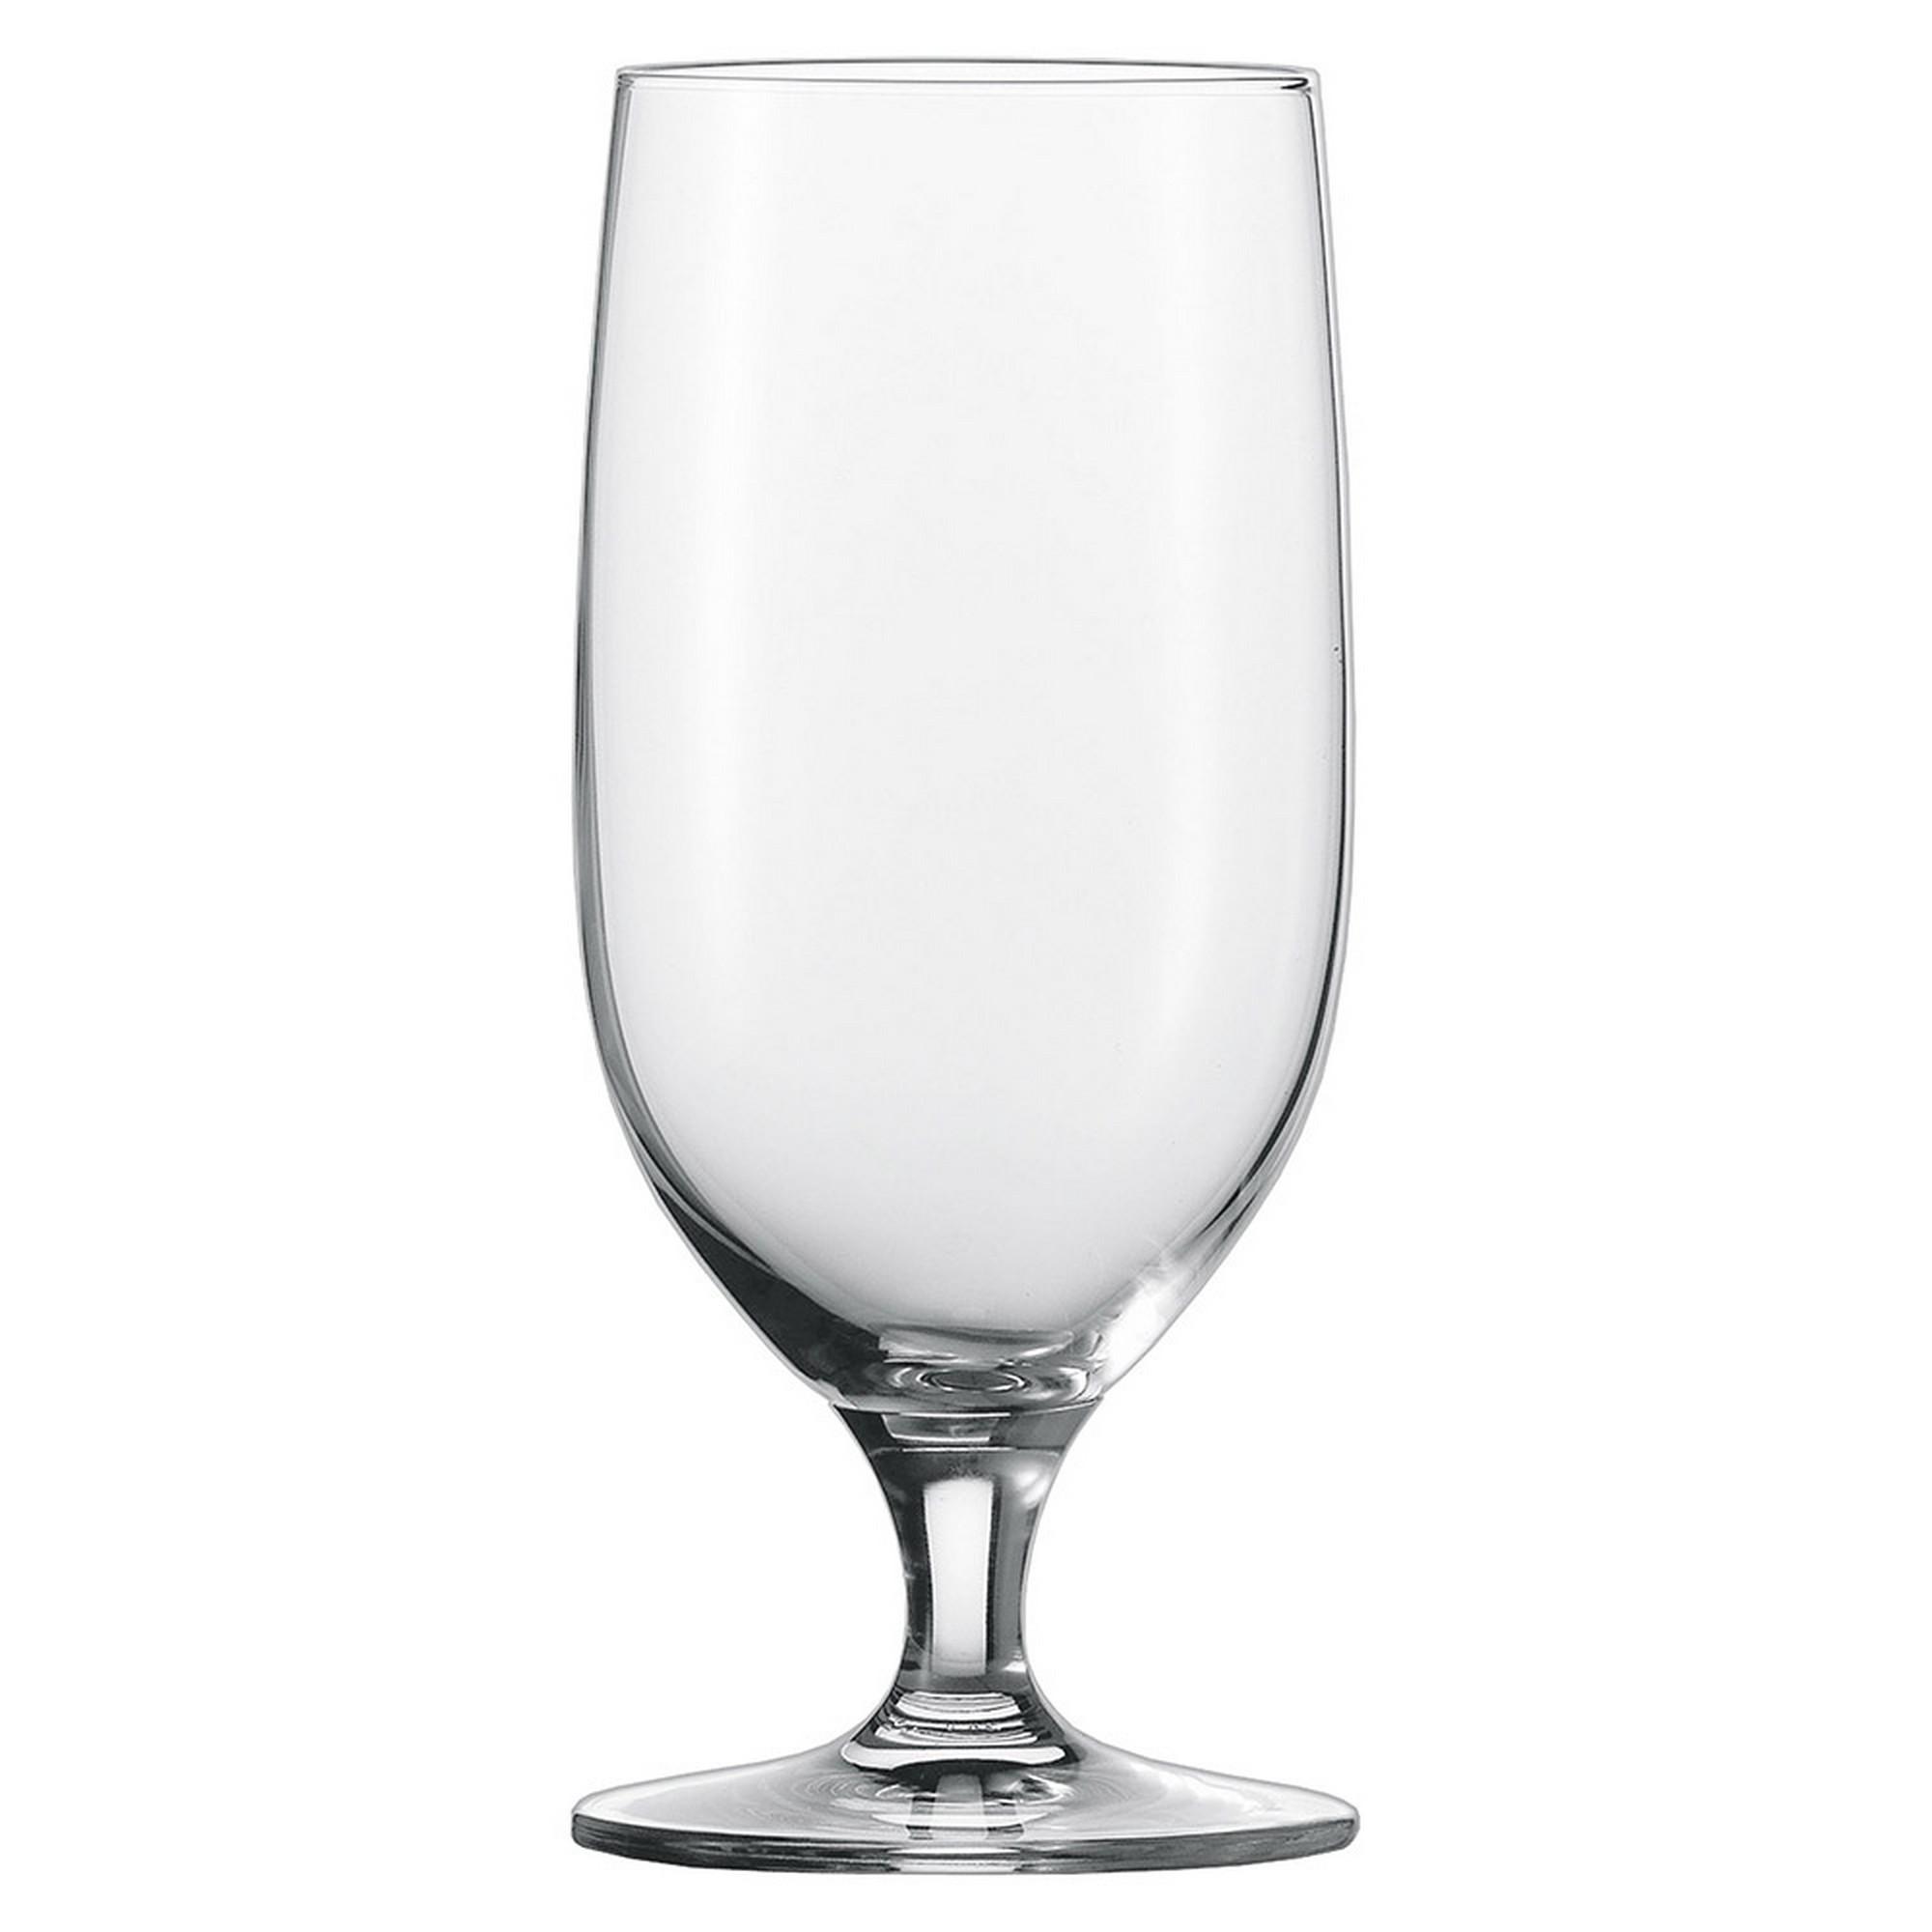 Taça para Cerveja 390ml Schott Zwiesel Mondial 6 Peças de Cristal